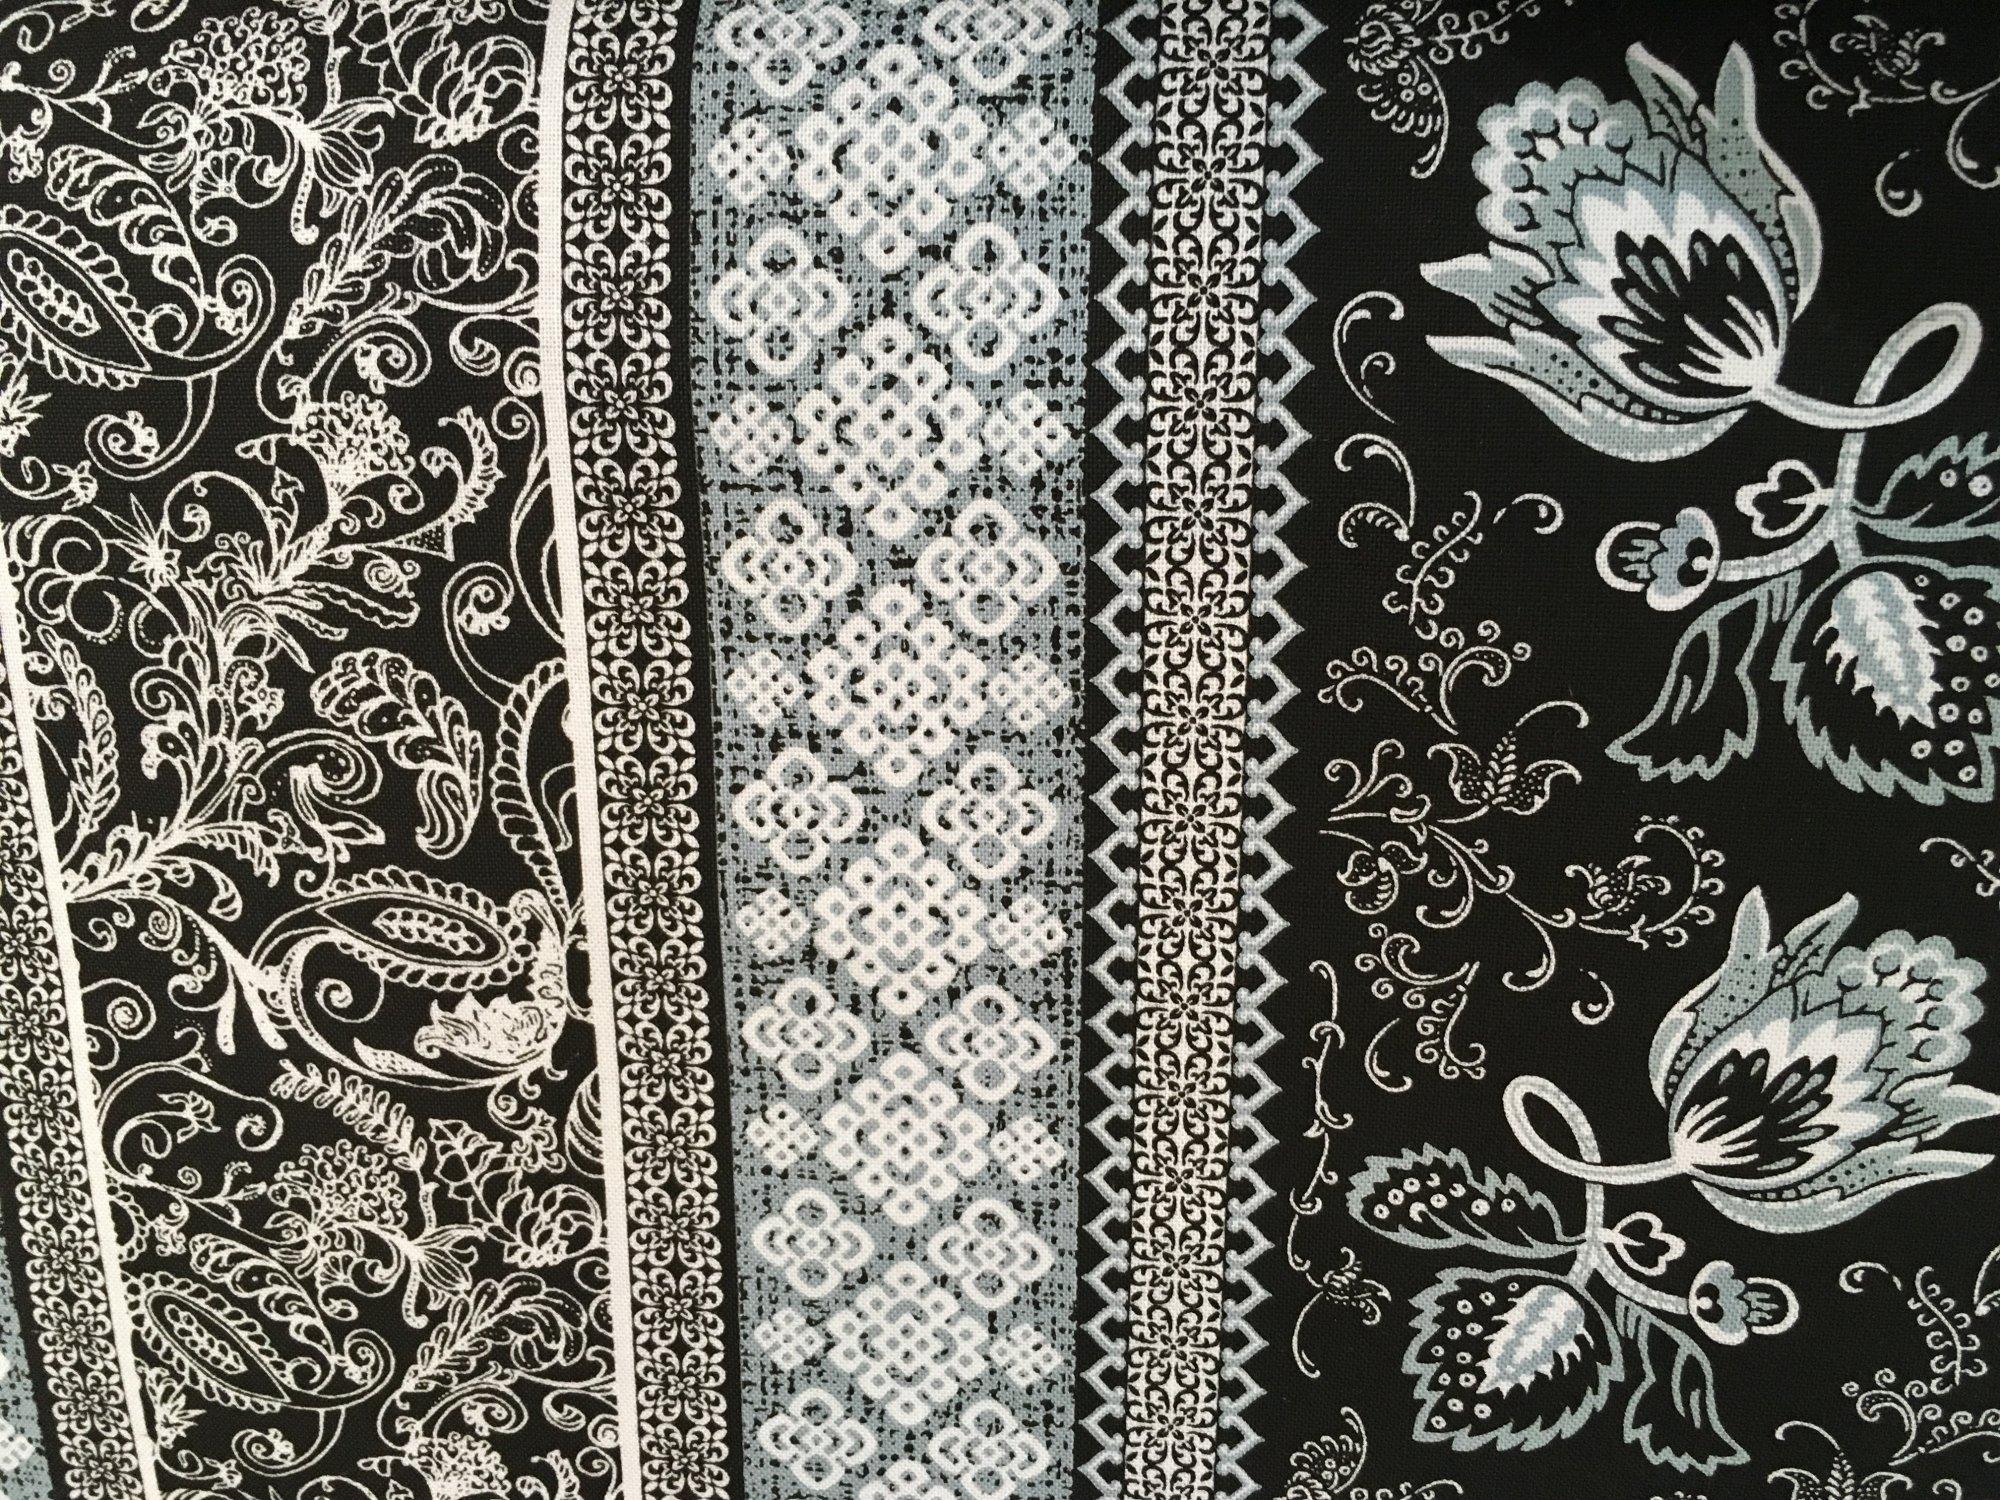 Marseille Black and white border fabric